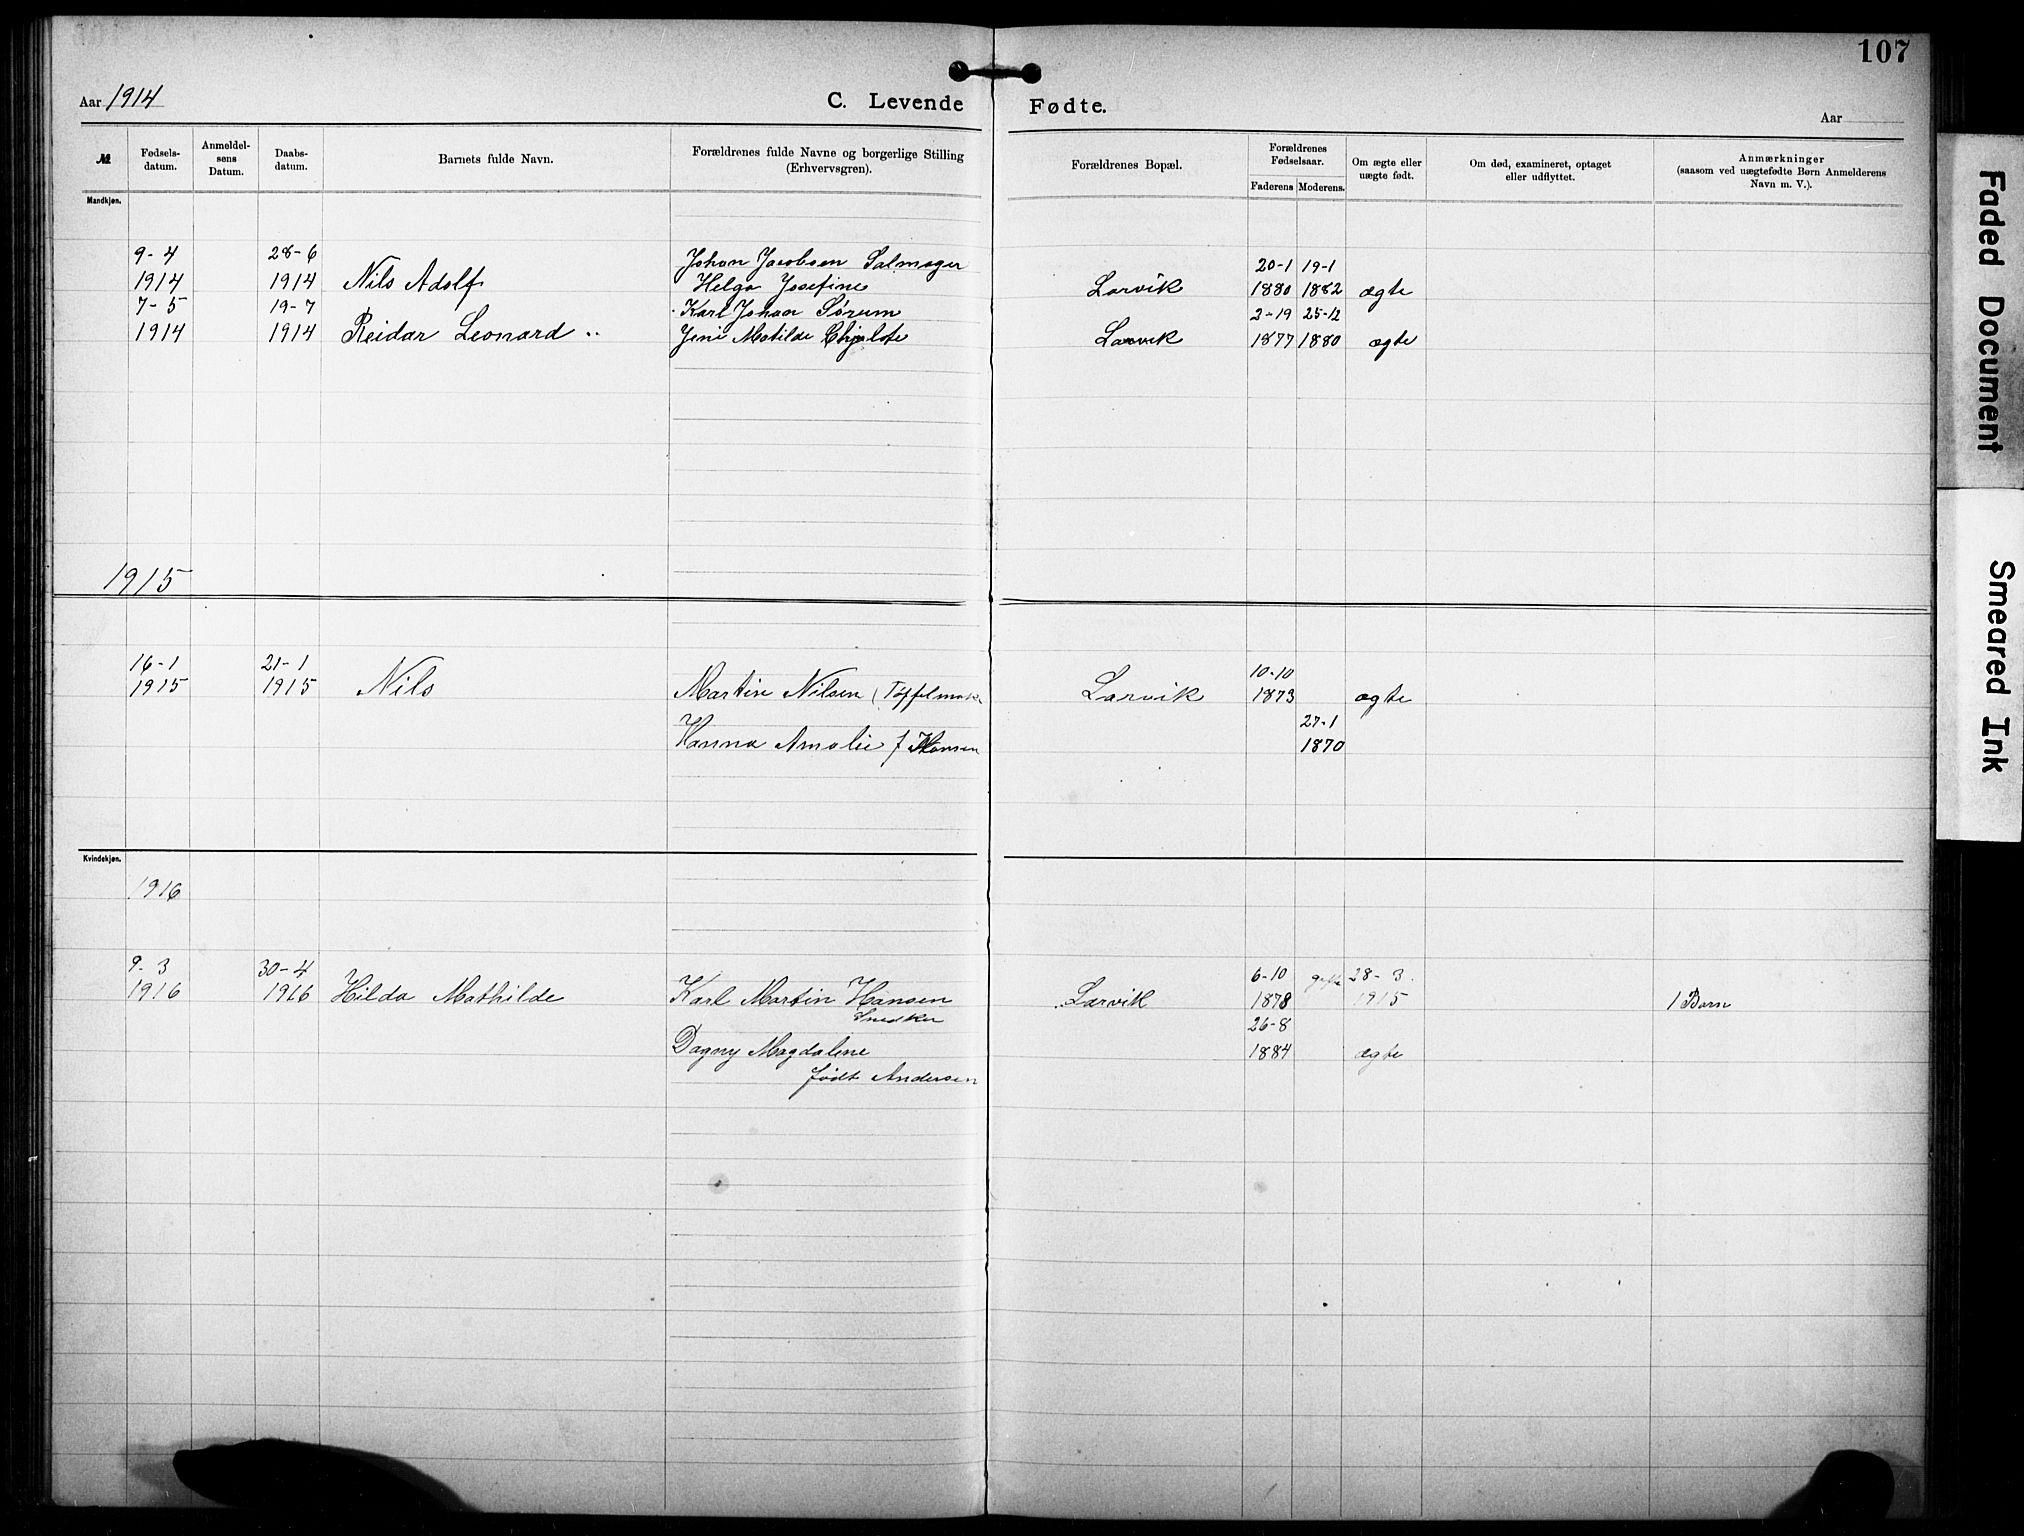 SAKO, Den katolsk-apostoliske menighet i Larvik, F/Fa/L0001: Dissenterprotokoll nr. 1, 1892-1933, s. 107